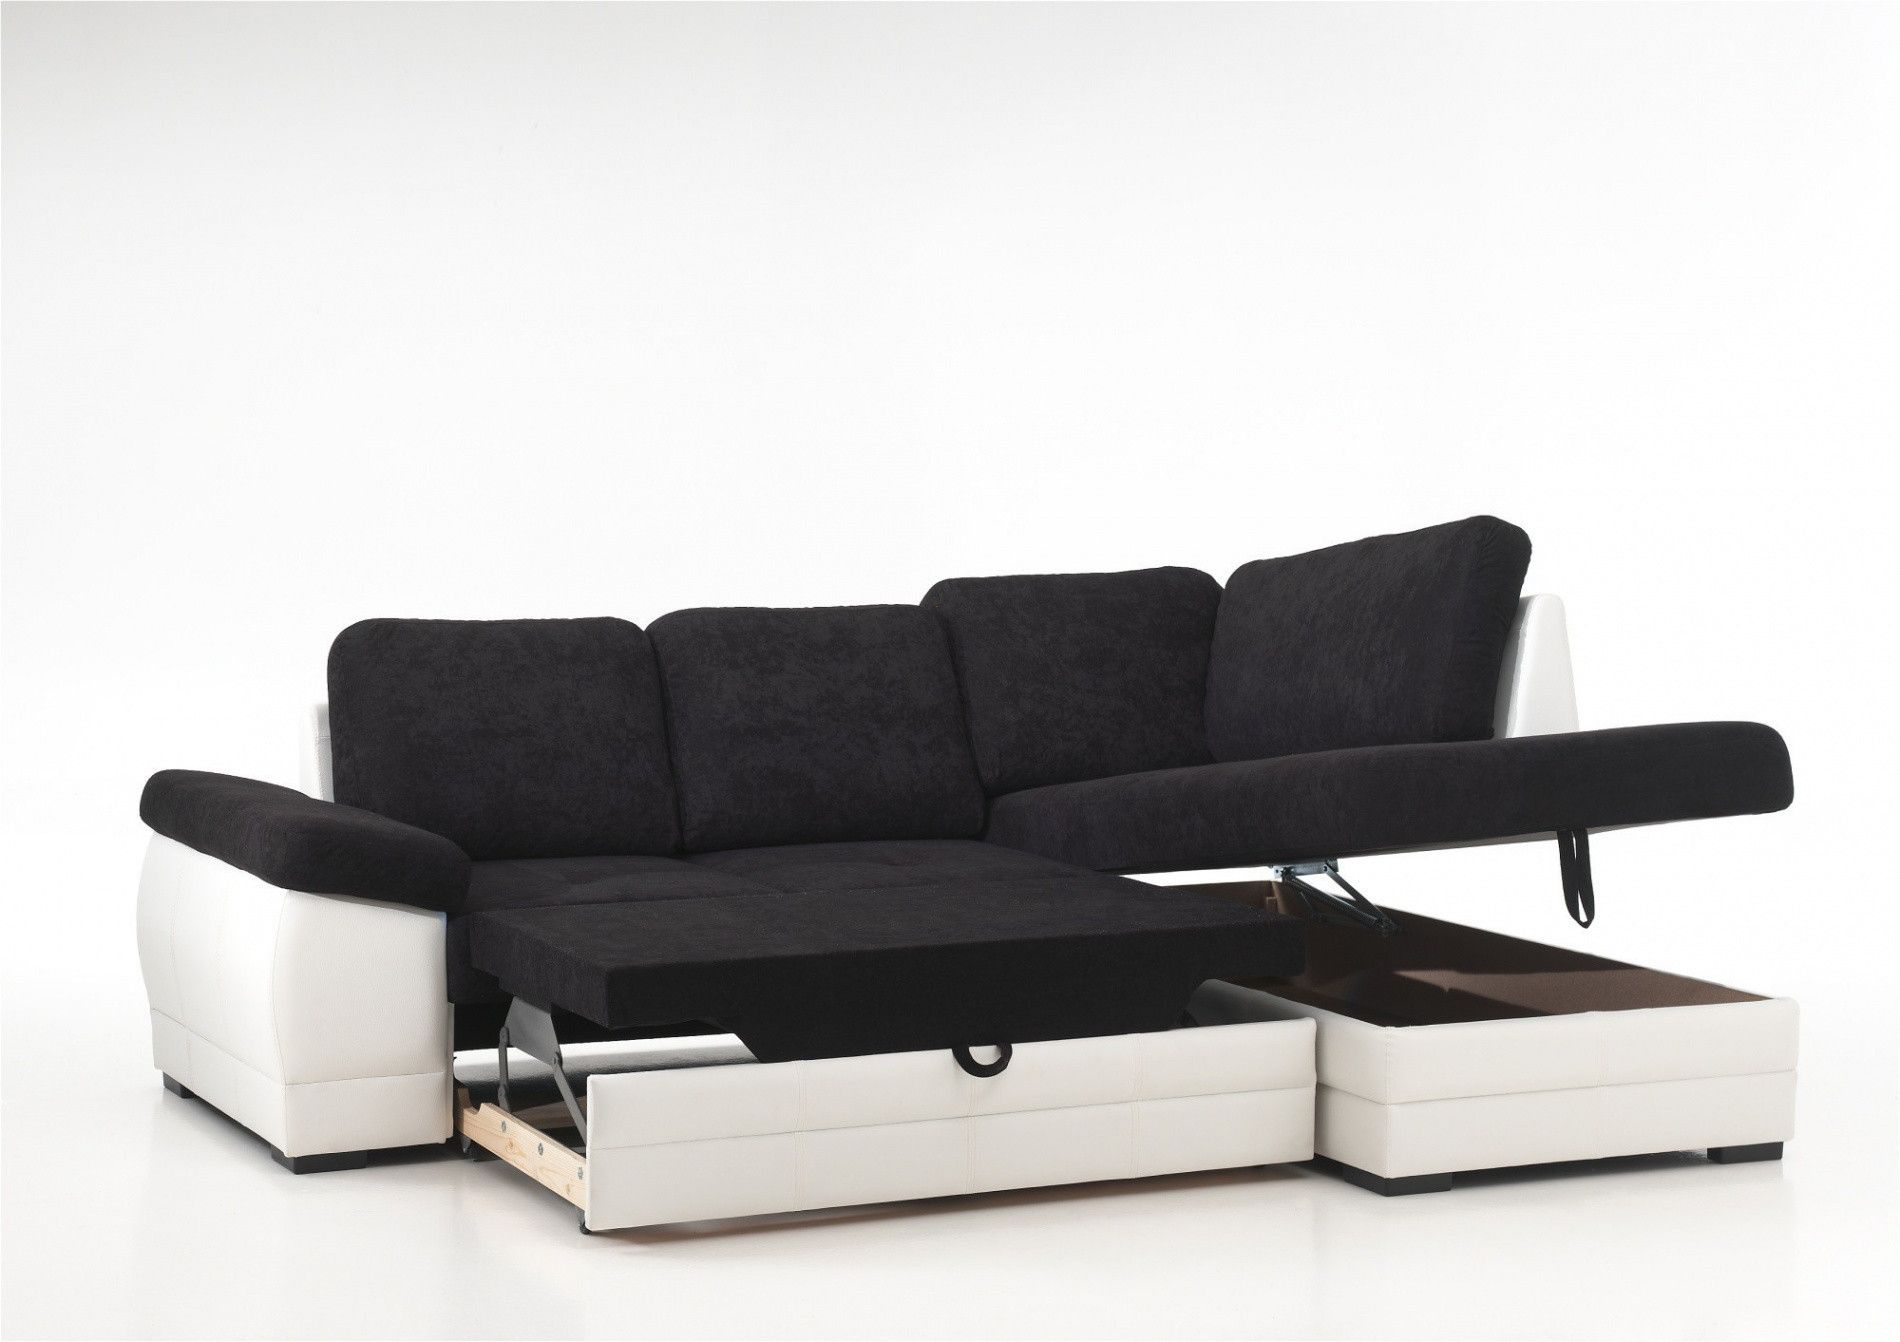 35 Beau Xxl Canape Suggestions Canape Cuir Design Canape Angle Convertible Canape Noir Et Blanc